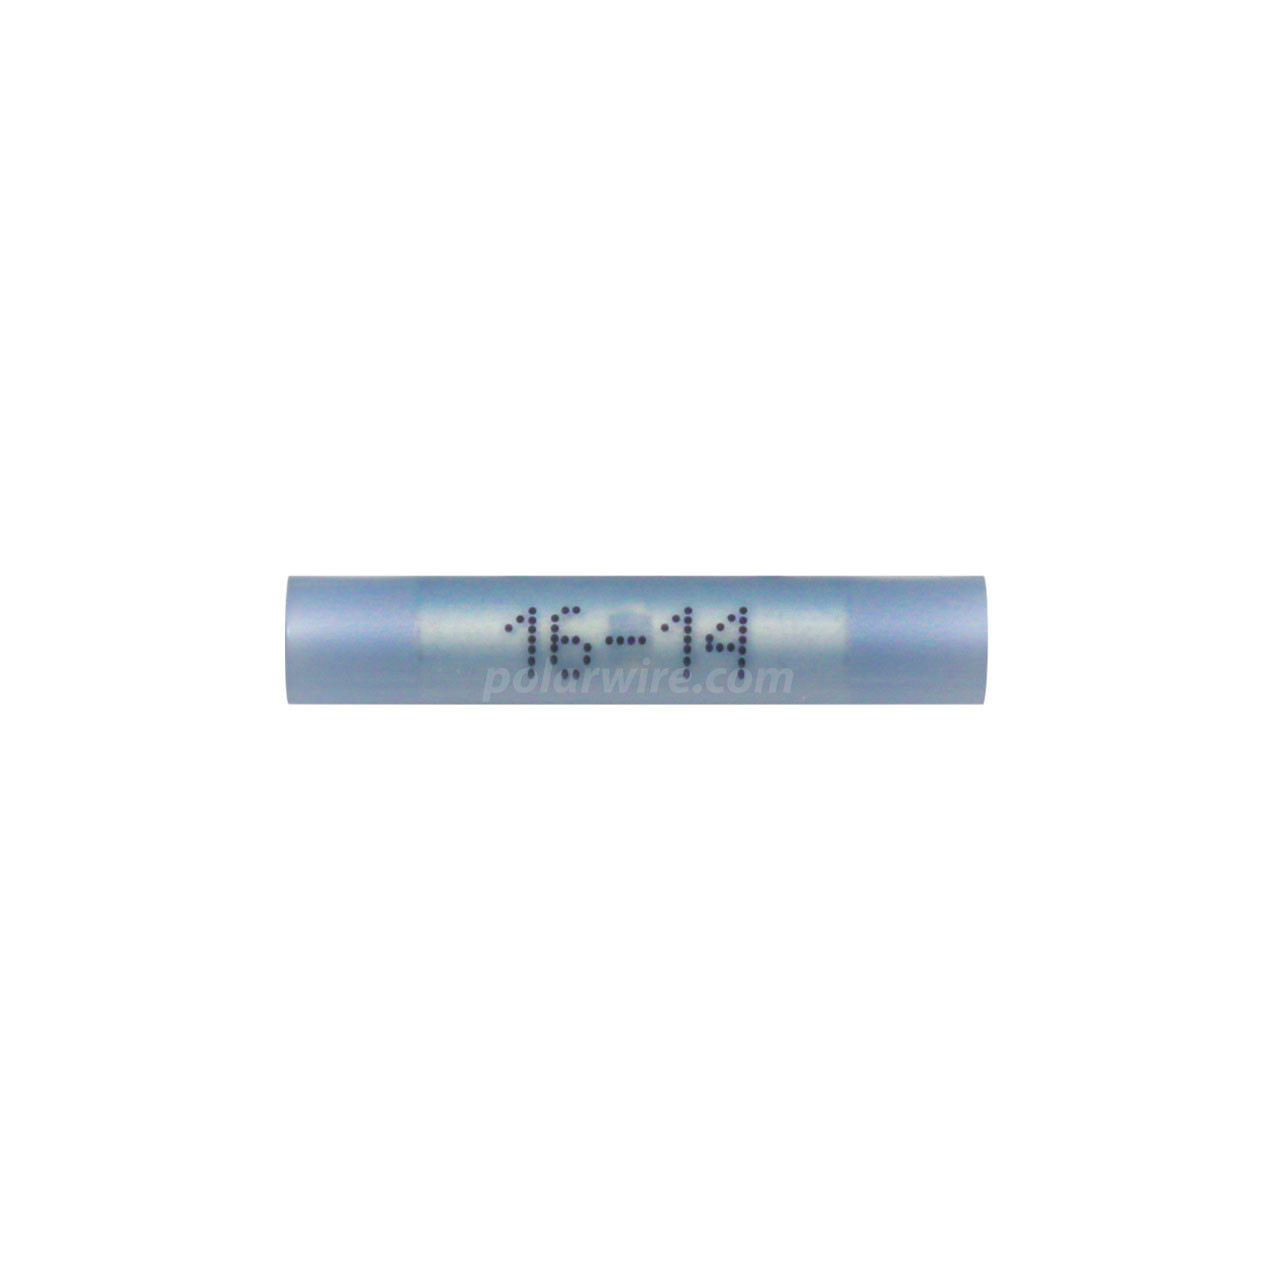 NYLON BUTT SPLICE 16-14GA  100 PACK MOLEX